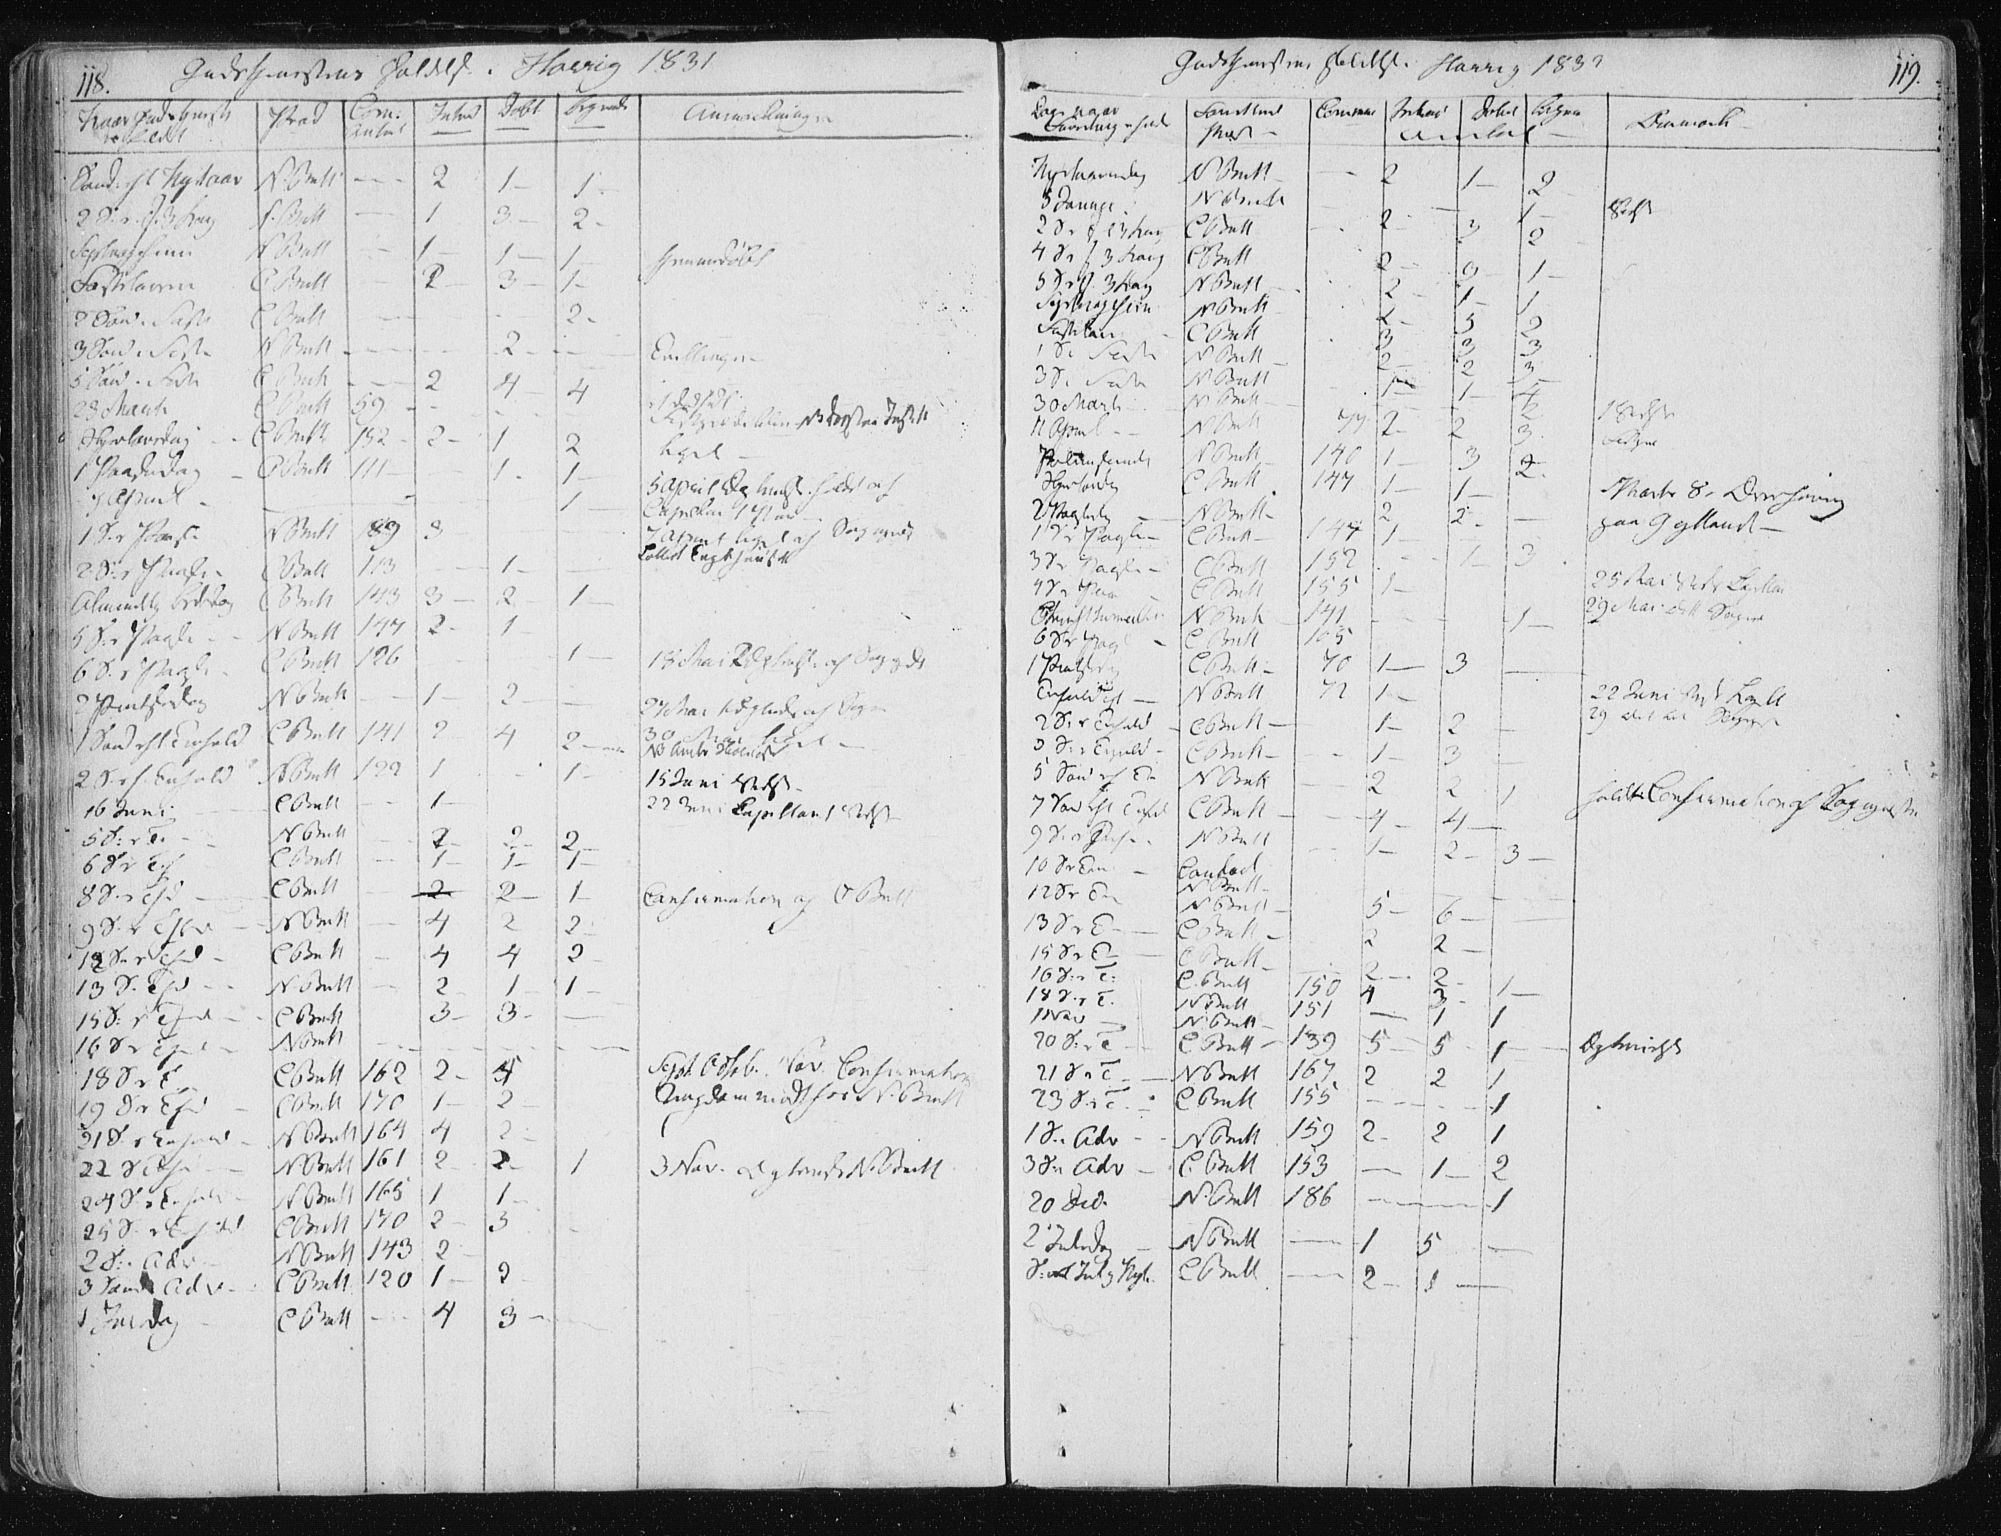 SAT, Ministerialprotokoller, klokkerbøker og fødselsregistre - Sør-Trøndelag, 687/L0993: Parish register (official) no. 687A03 /2, 1788-1815, p. 118-119